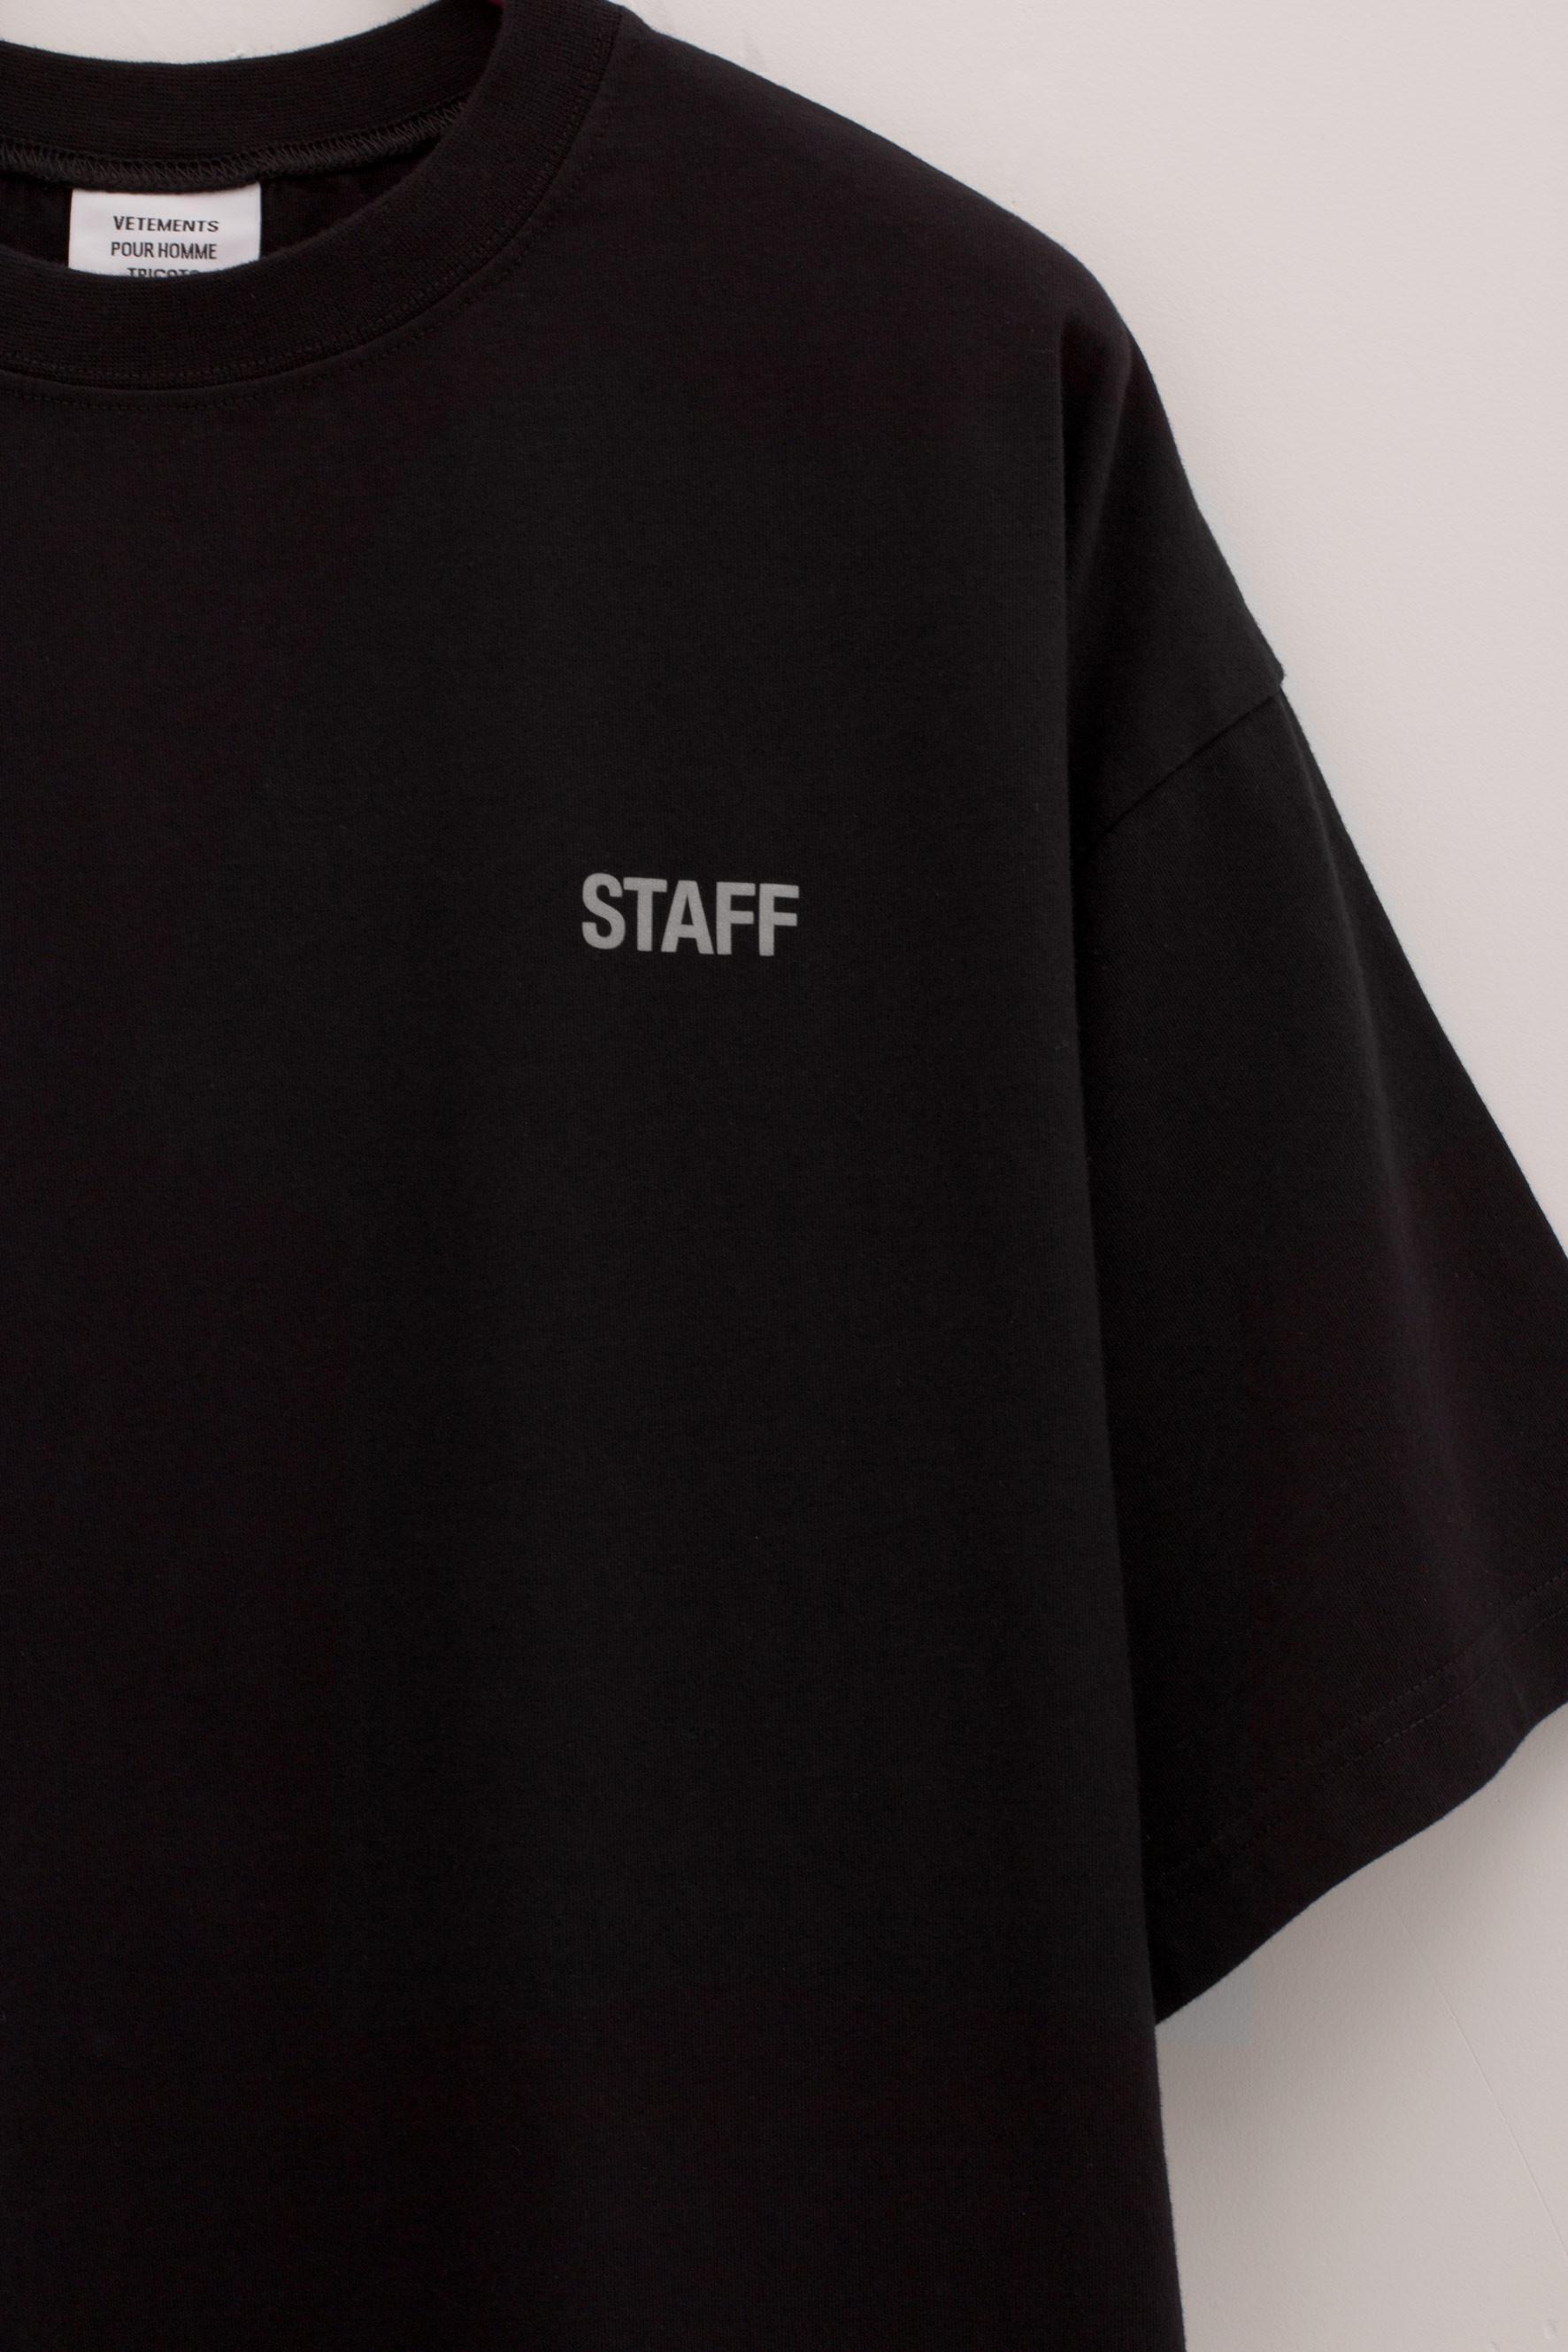 4bd5466c5778 Vetements Staff Reflector T-shirt in Black for Men - Lyst